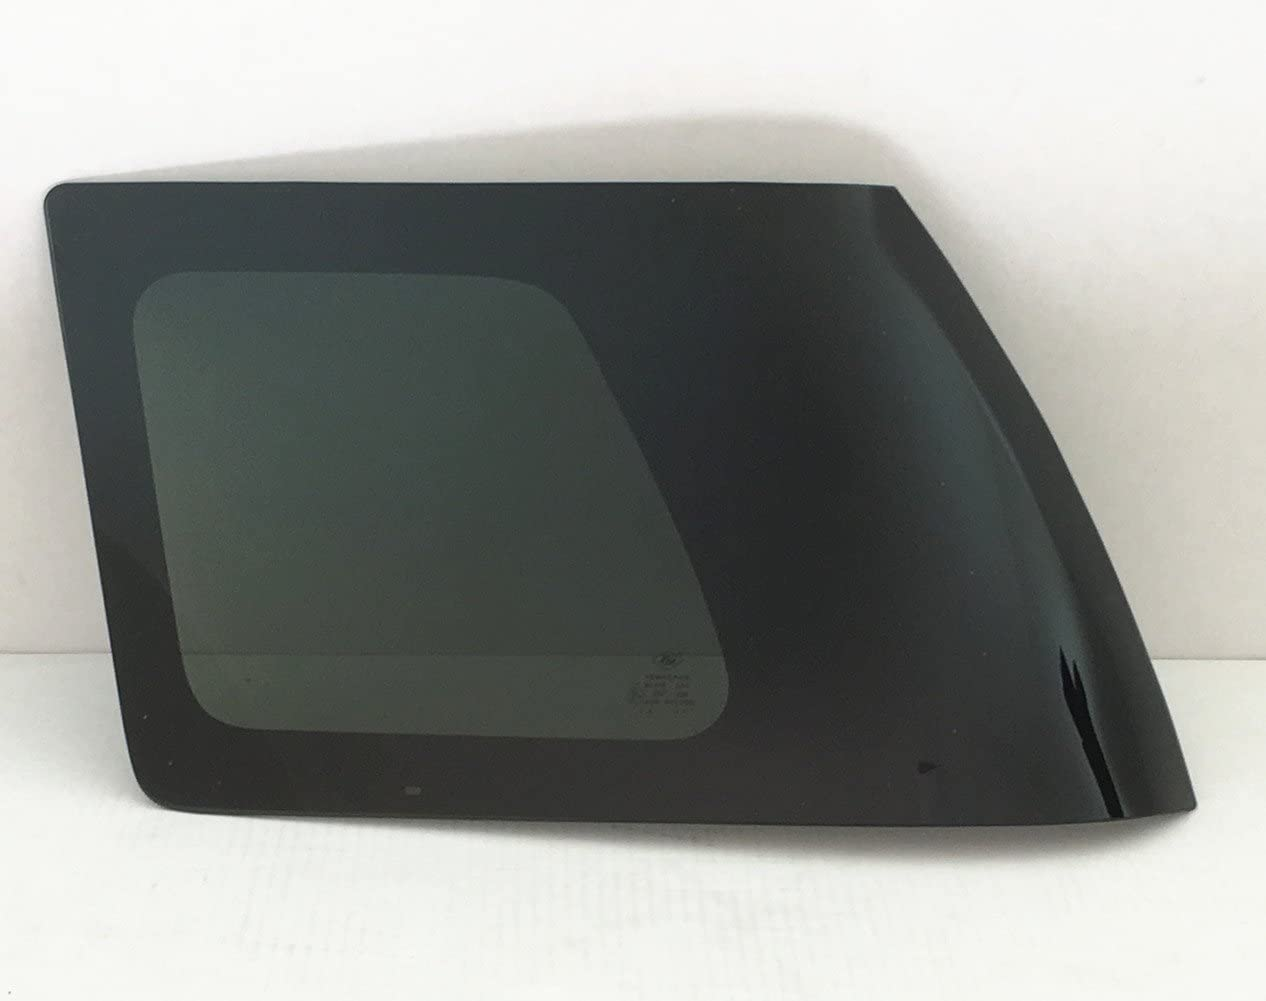 NAGD Driver//Left Side Rear Quarter Window Replacement Glass for 2007-2014 Toyota FJ Cruiser/4 Door Utility